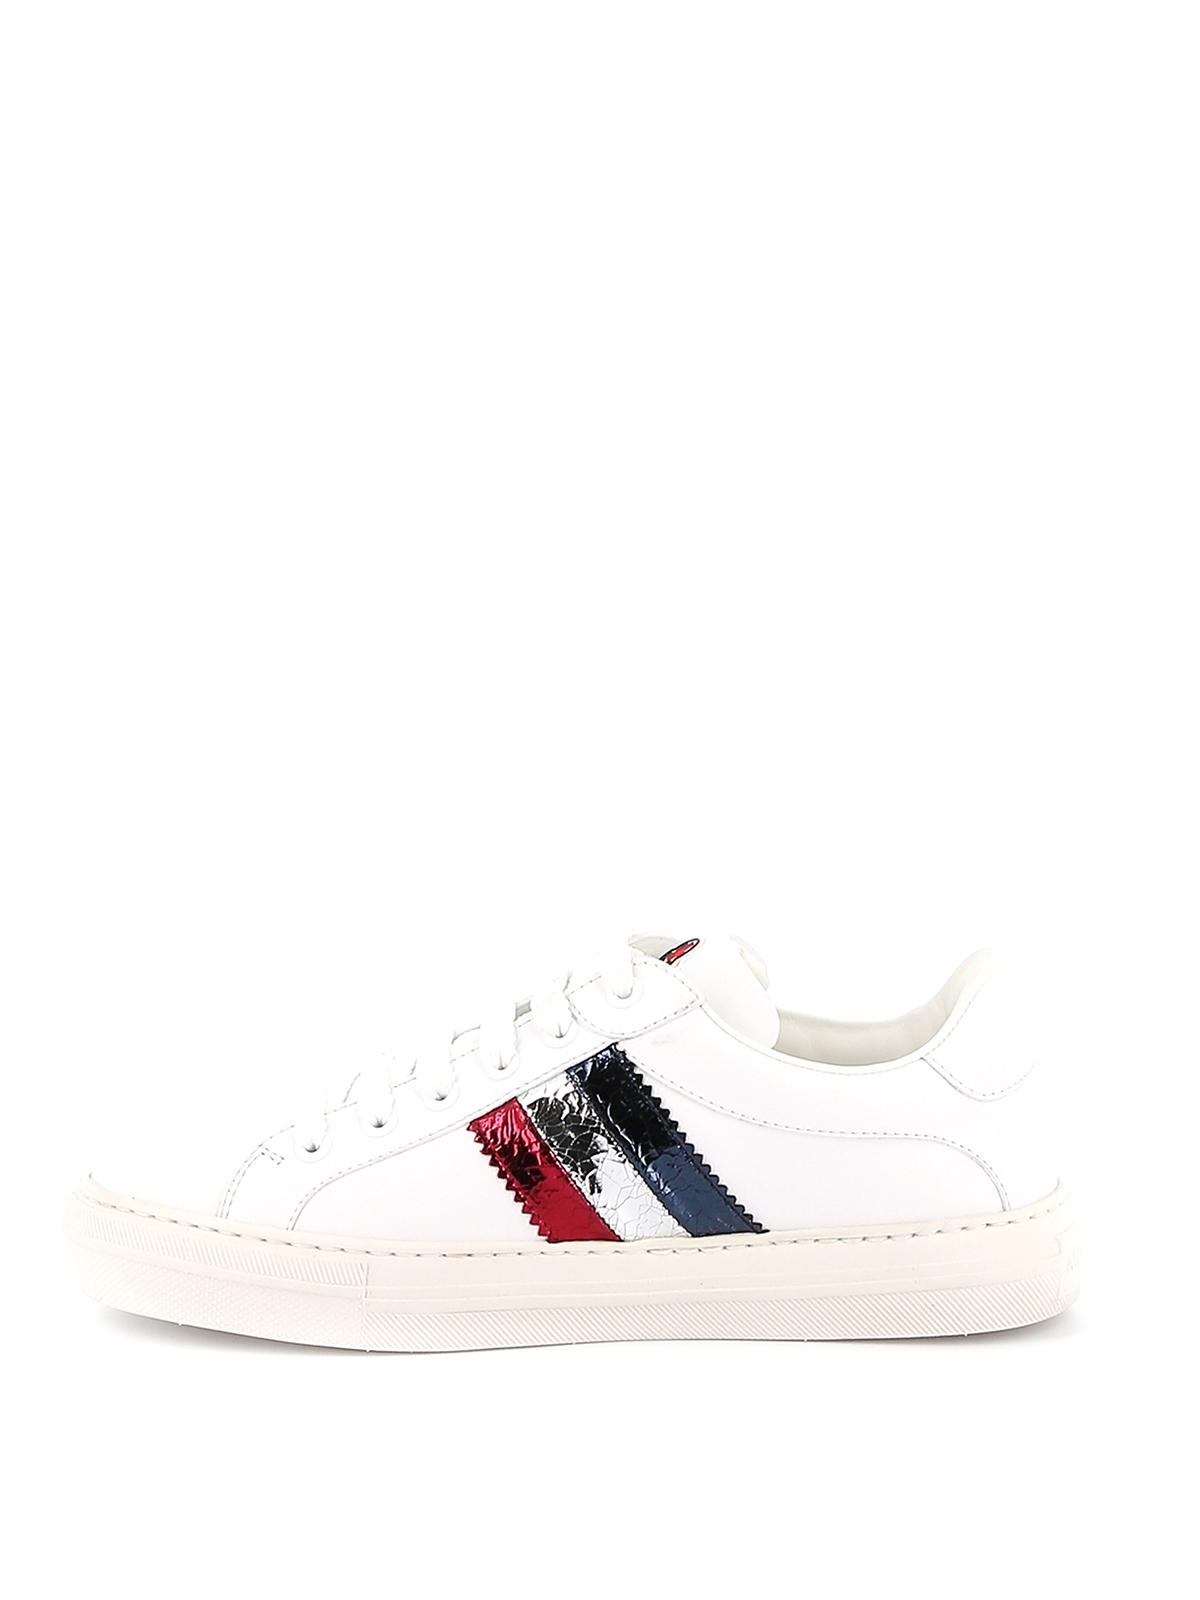 Moncler ARIEL da Donna, Sneakers   Store Ufficiale